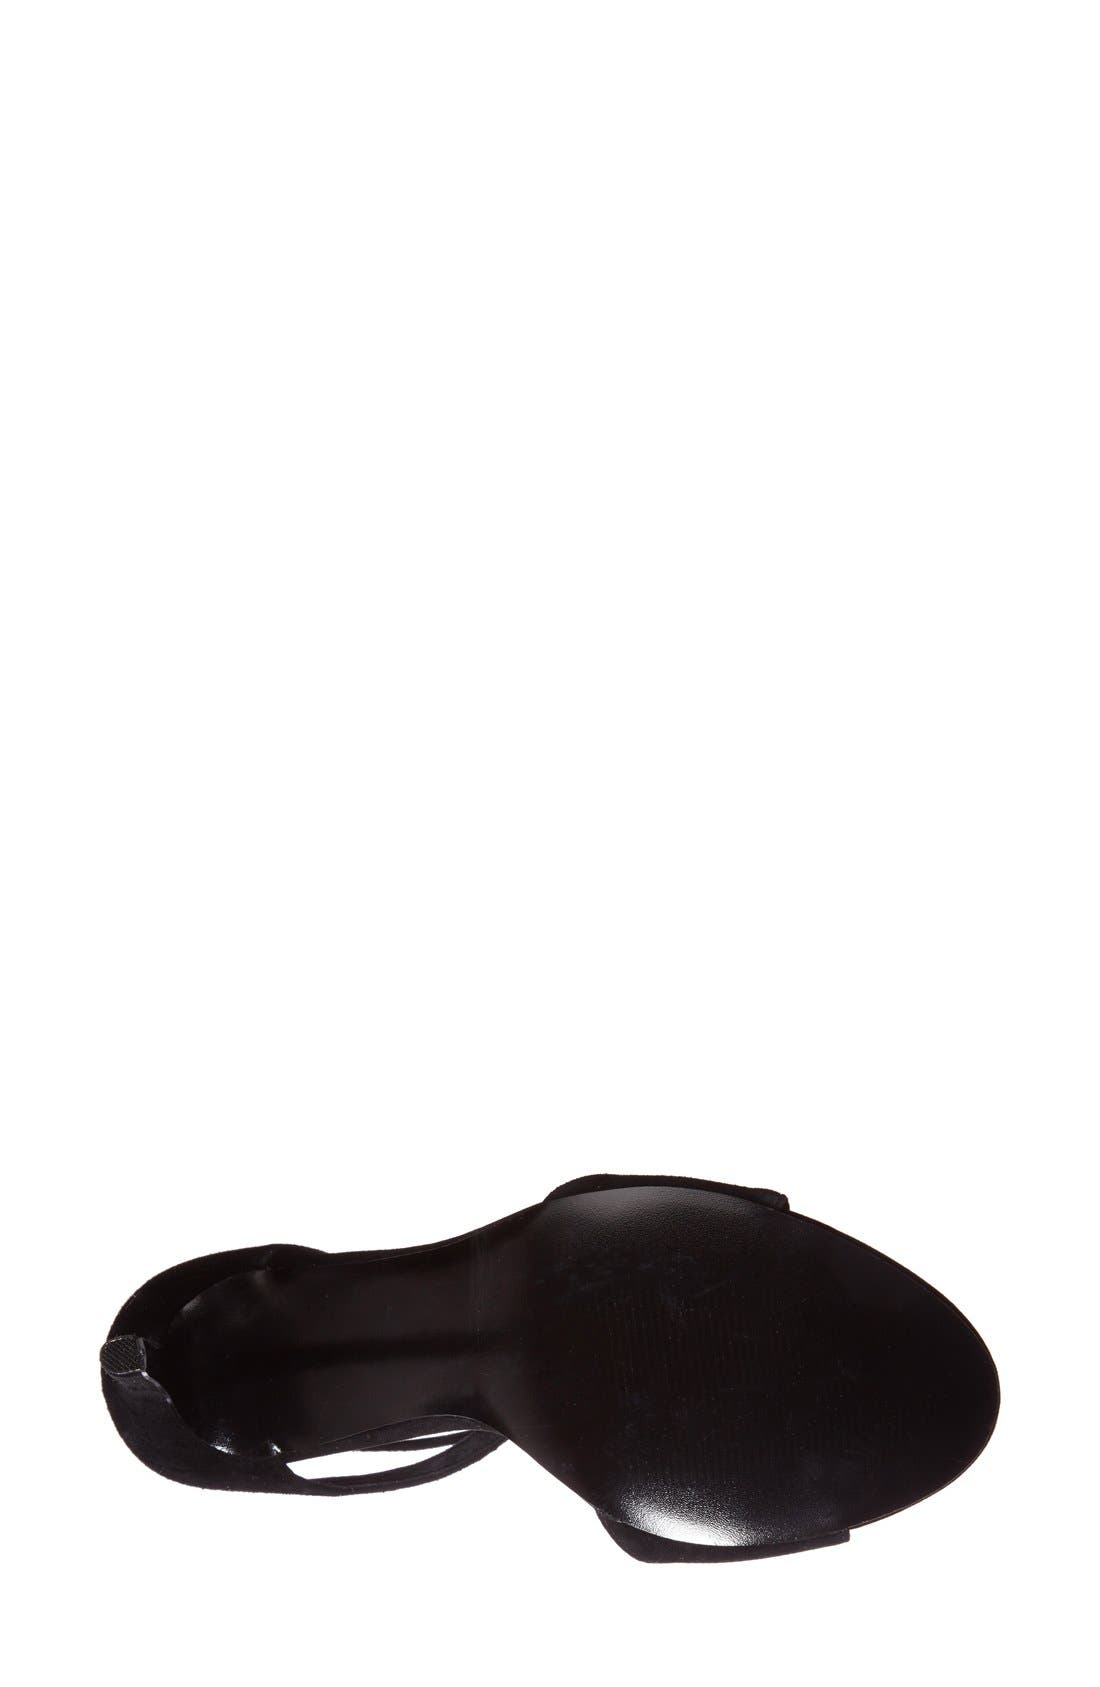 'Semona' Suede Ankle Strap Sandal,                             Alternate thumbnail 4, color,                             001